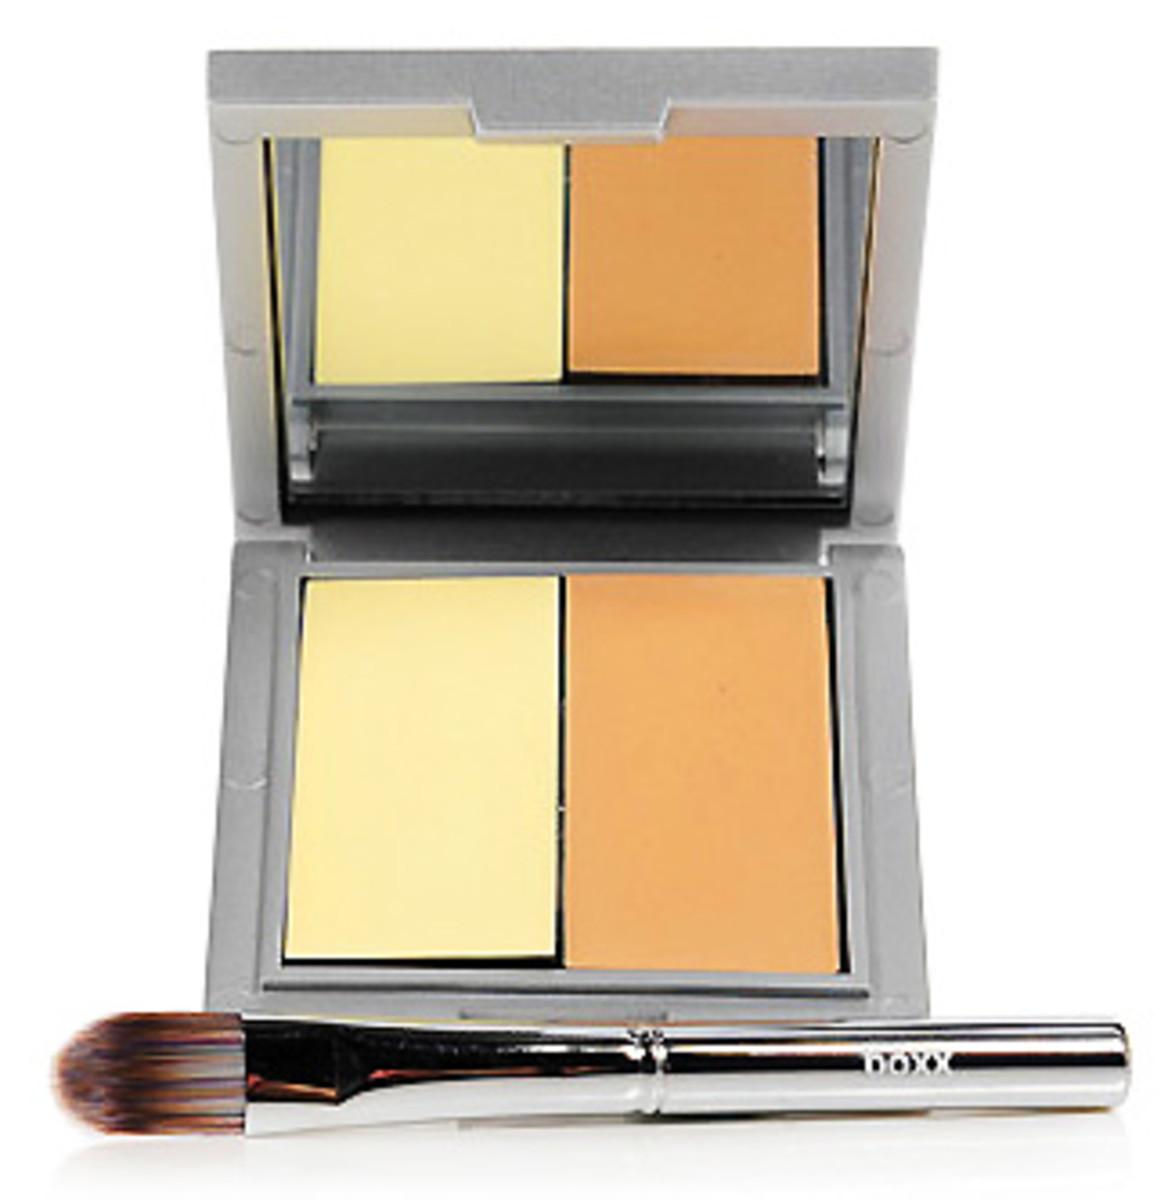 Boxx Cosmetics_Cream Corrector Kit